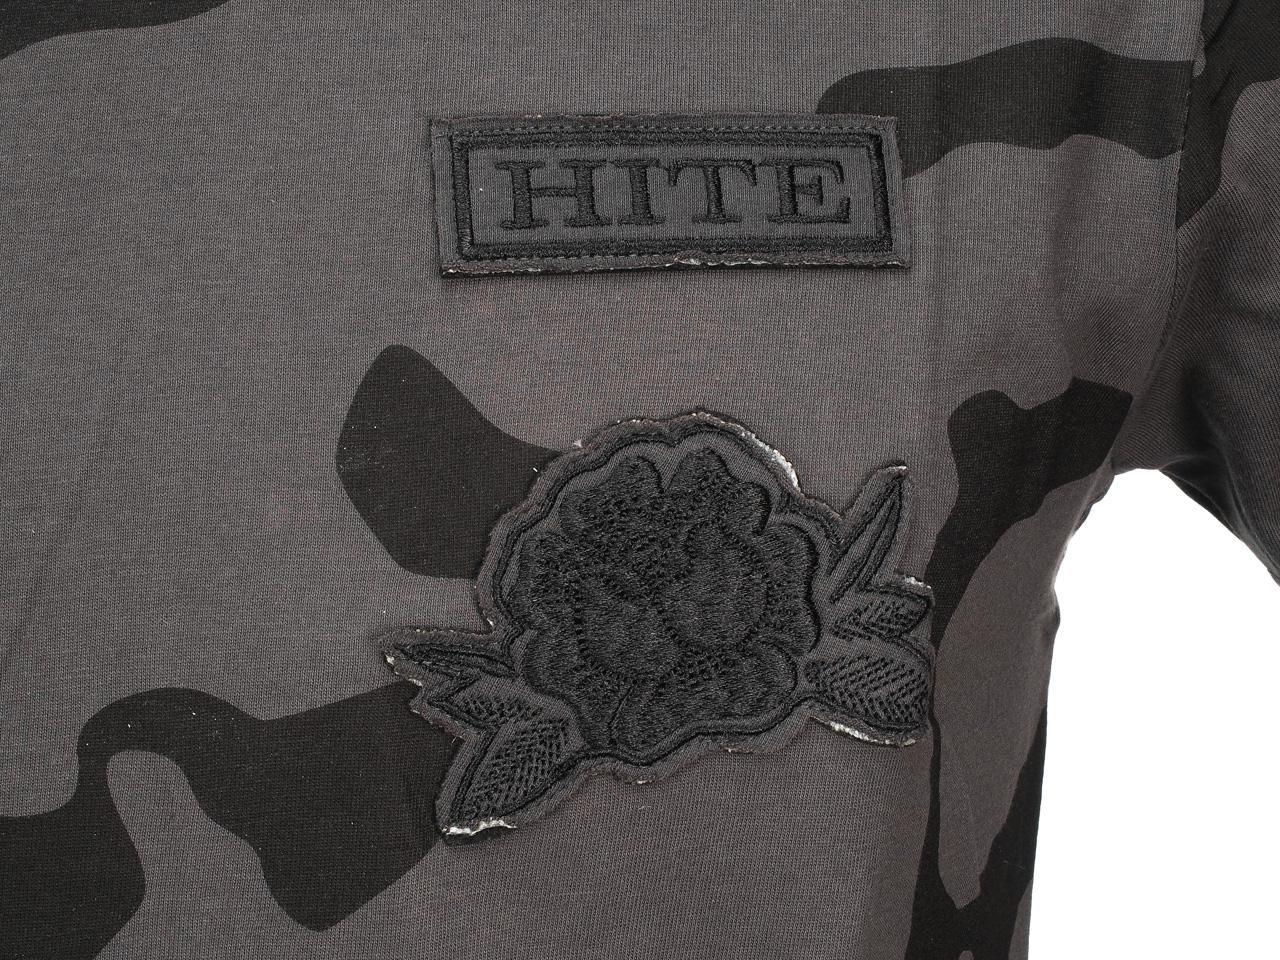 Short-Sleeve-T-Shirt-Hite-Couture-bet-Camo-Anth-Mc-Tee-Grey-11535-New thumbnail 3